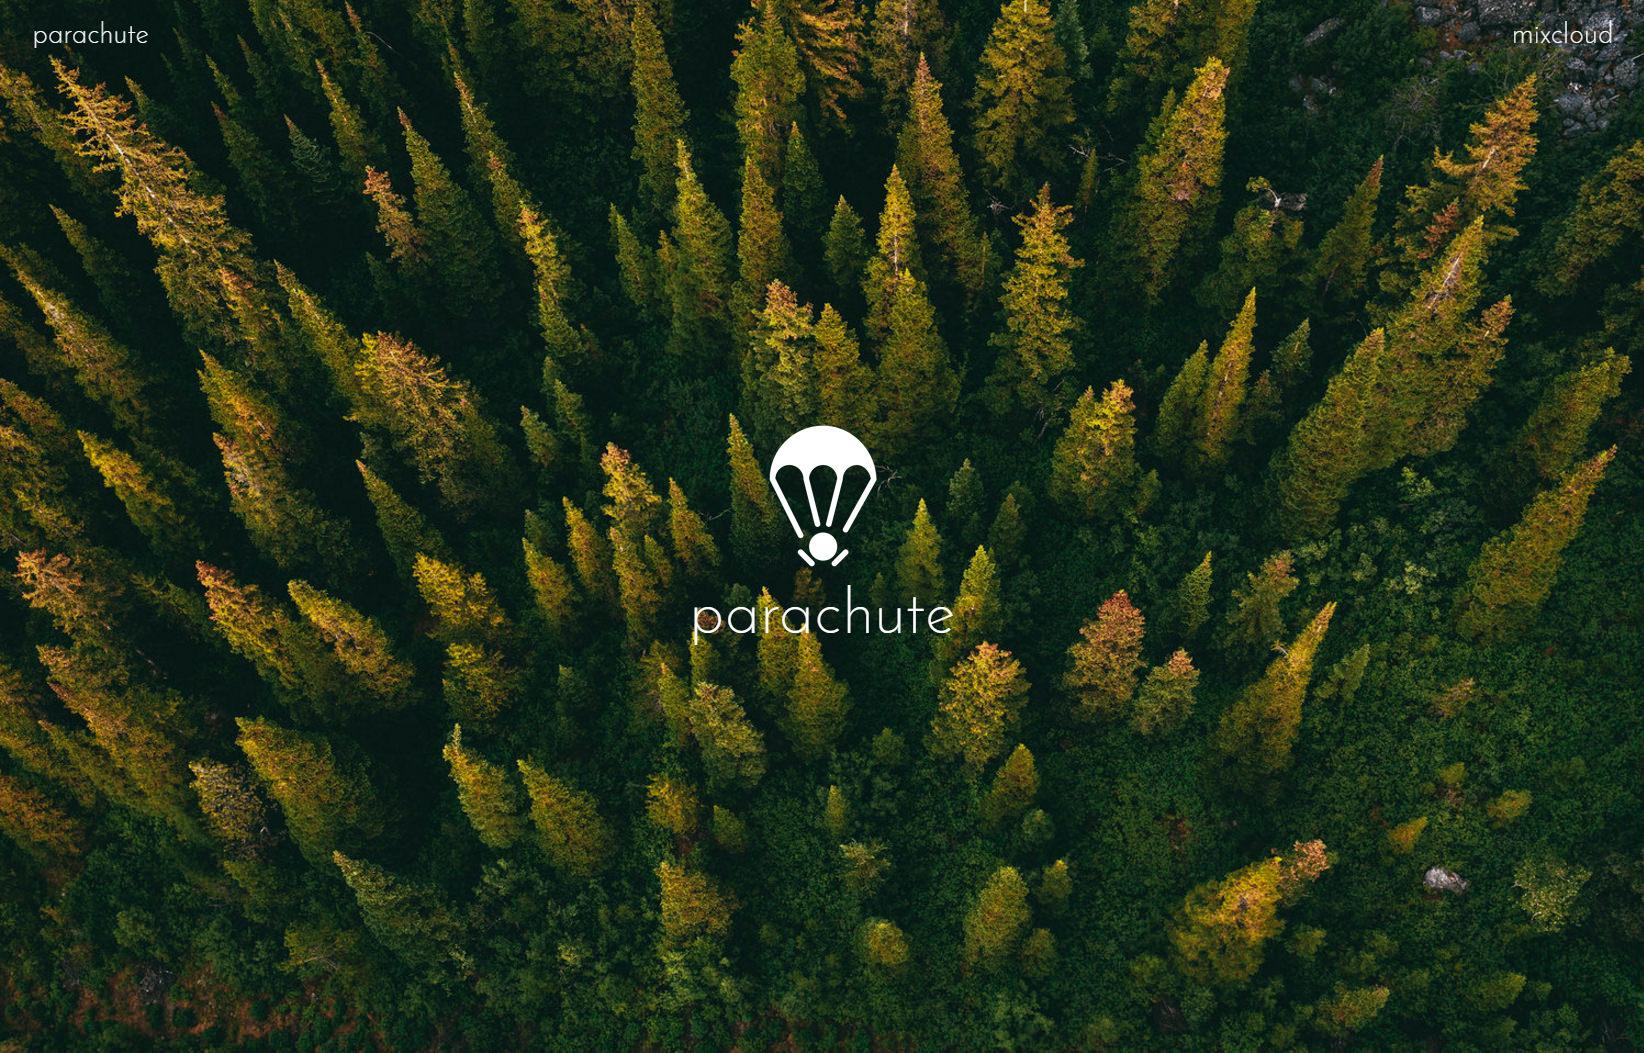 ouur_parachute